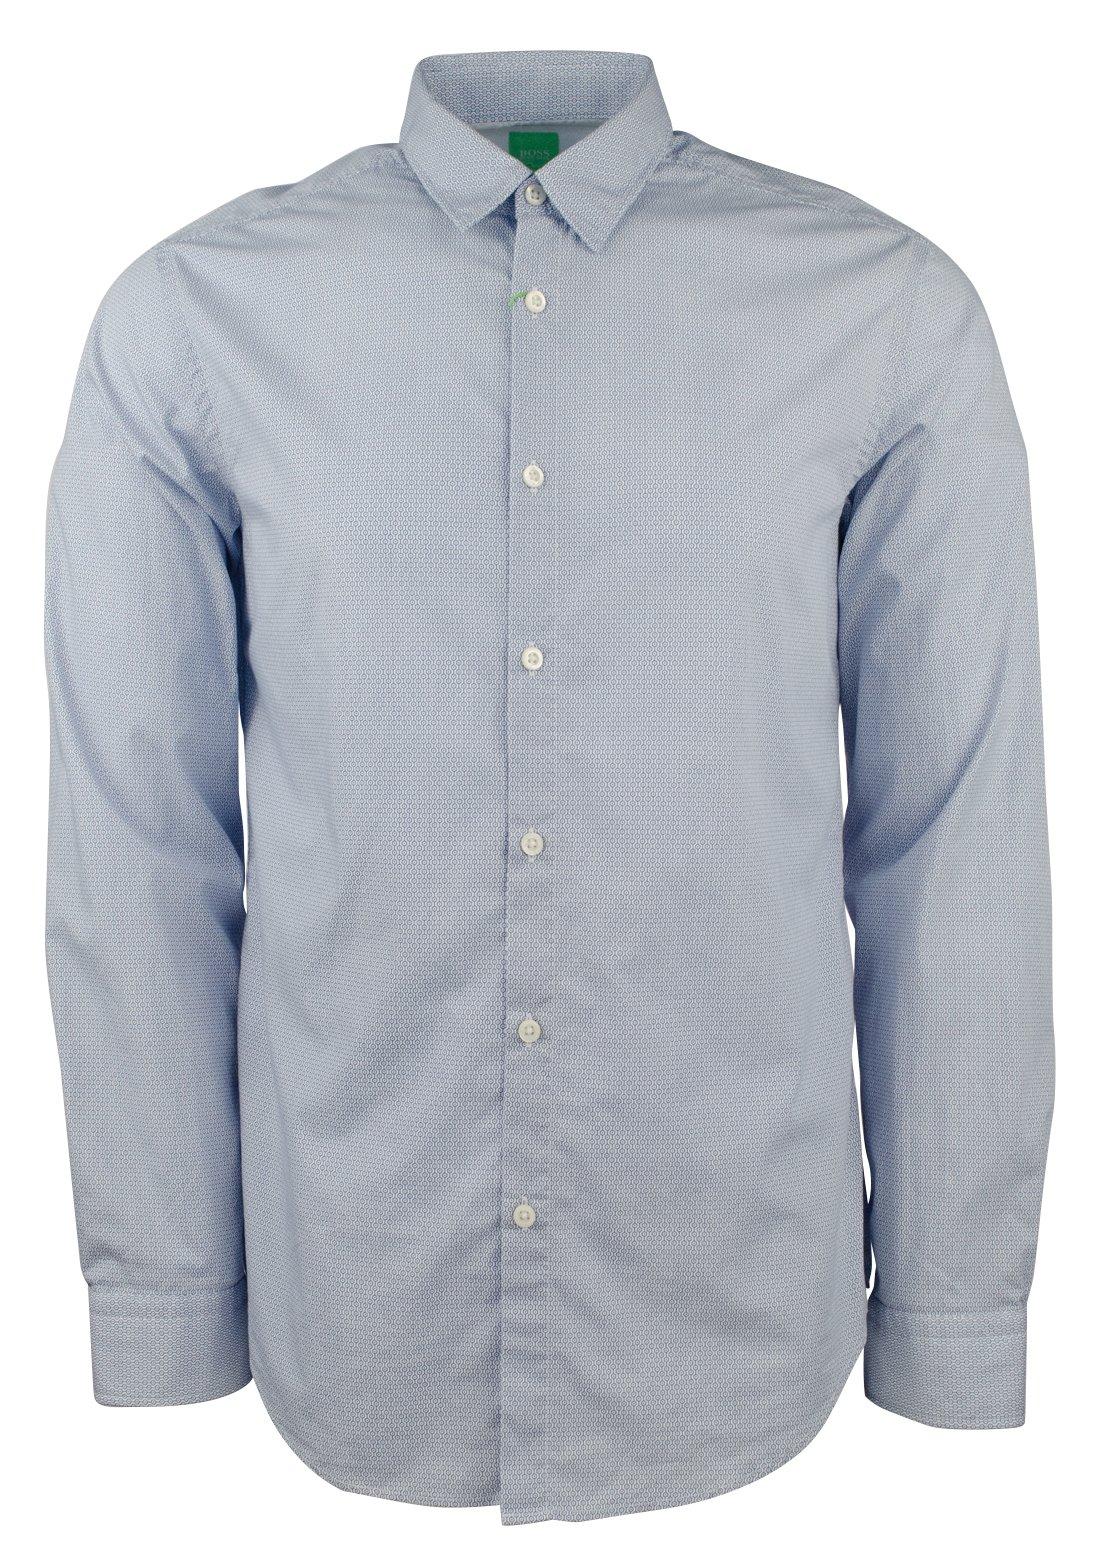 Hugo Boss Men's Green Label C-Bustai Patterned Regular Fit Shirt-BW-L